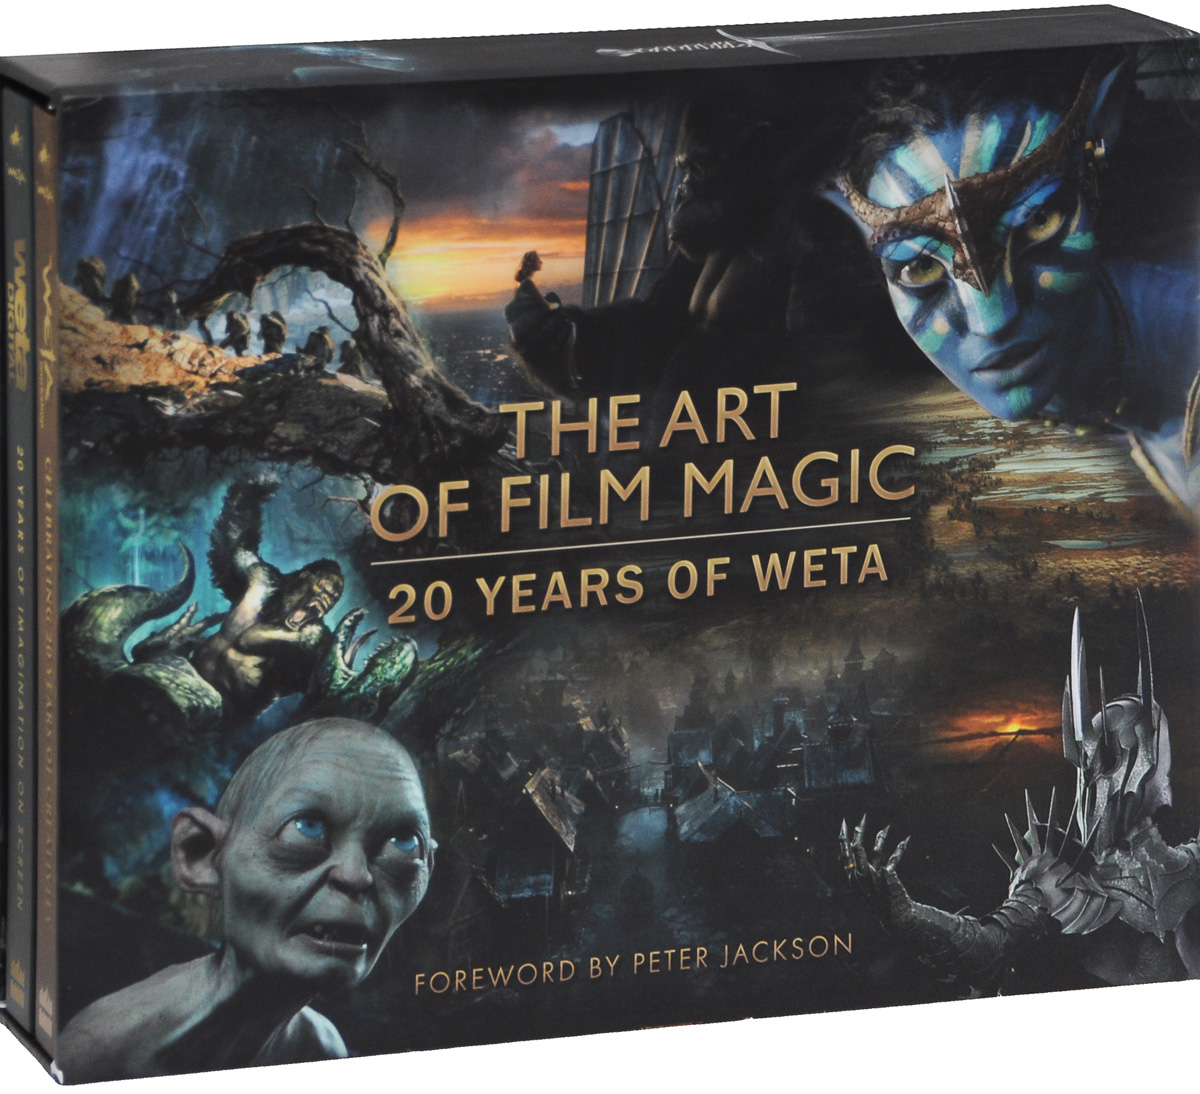 The Art of Film Magic: 20 Years of Weta 75 years of dc comics the art of modern mythmaking